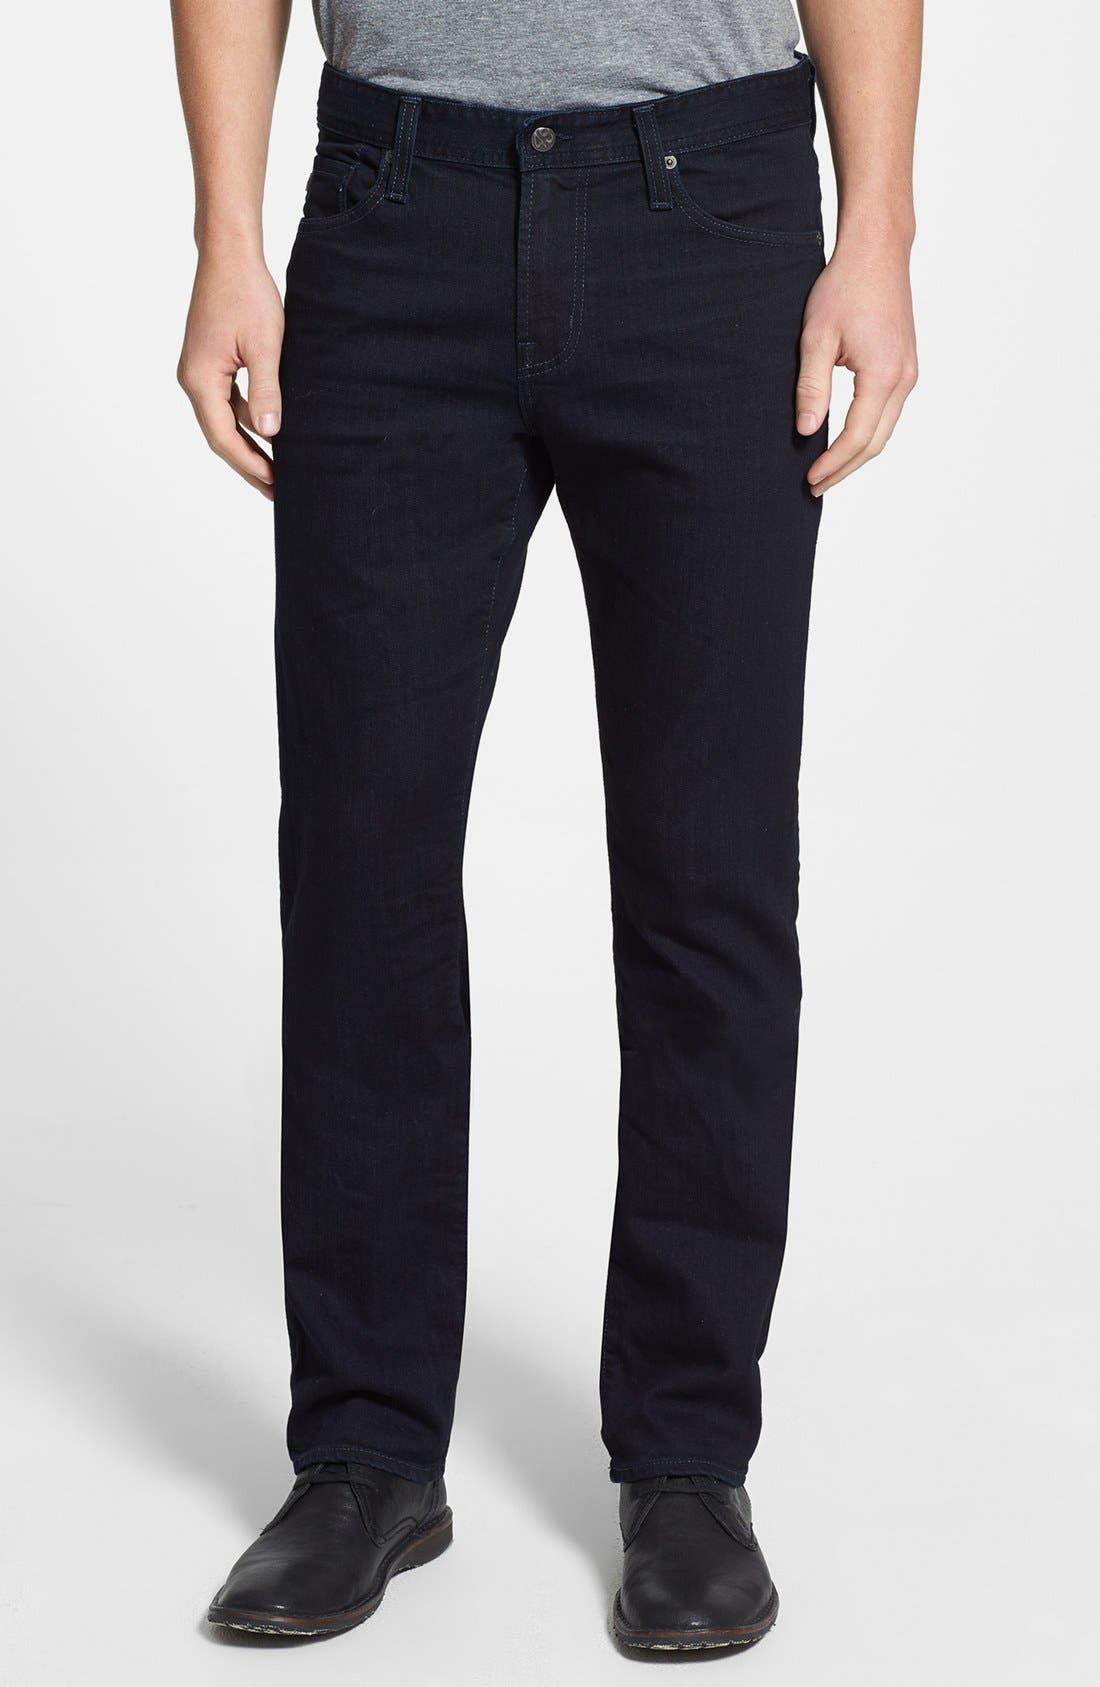 'Graduate' Tailored Fit Straight Leg Jeans,                             Main thumbnail 1, color,                             409